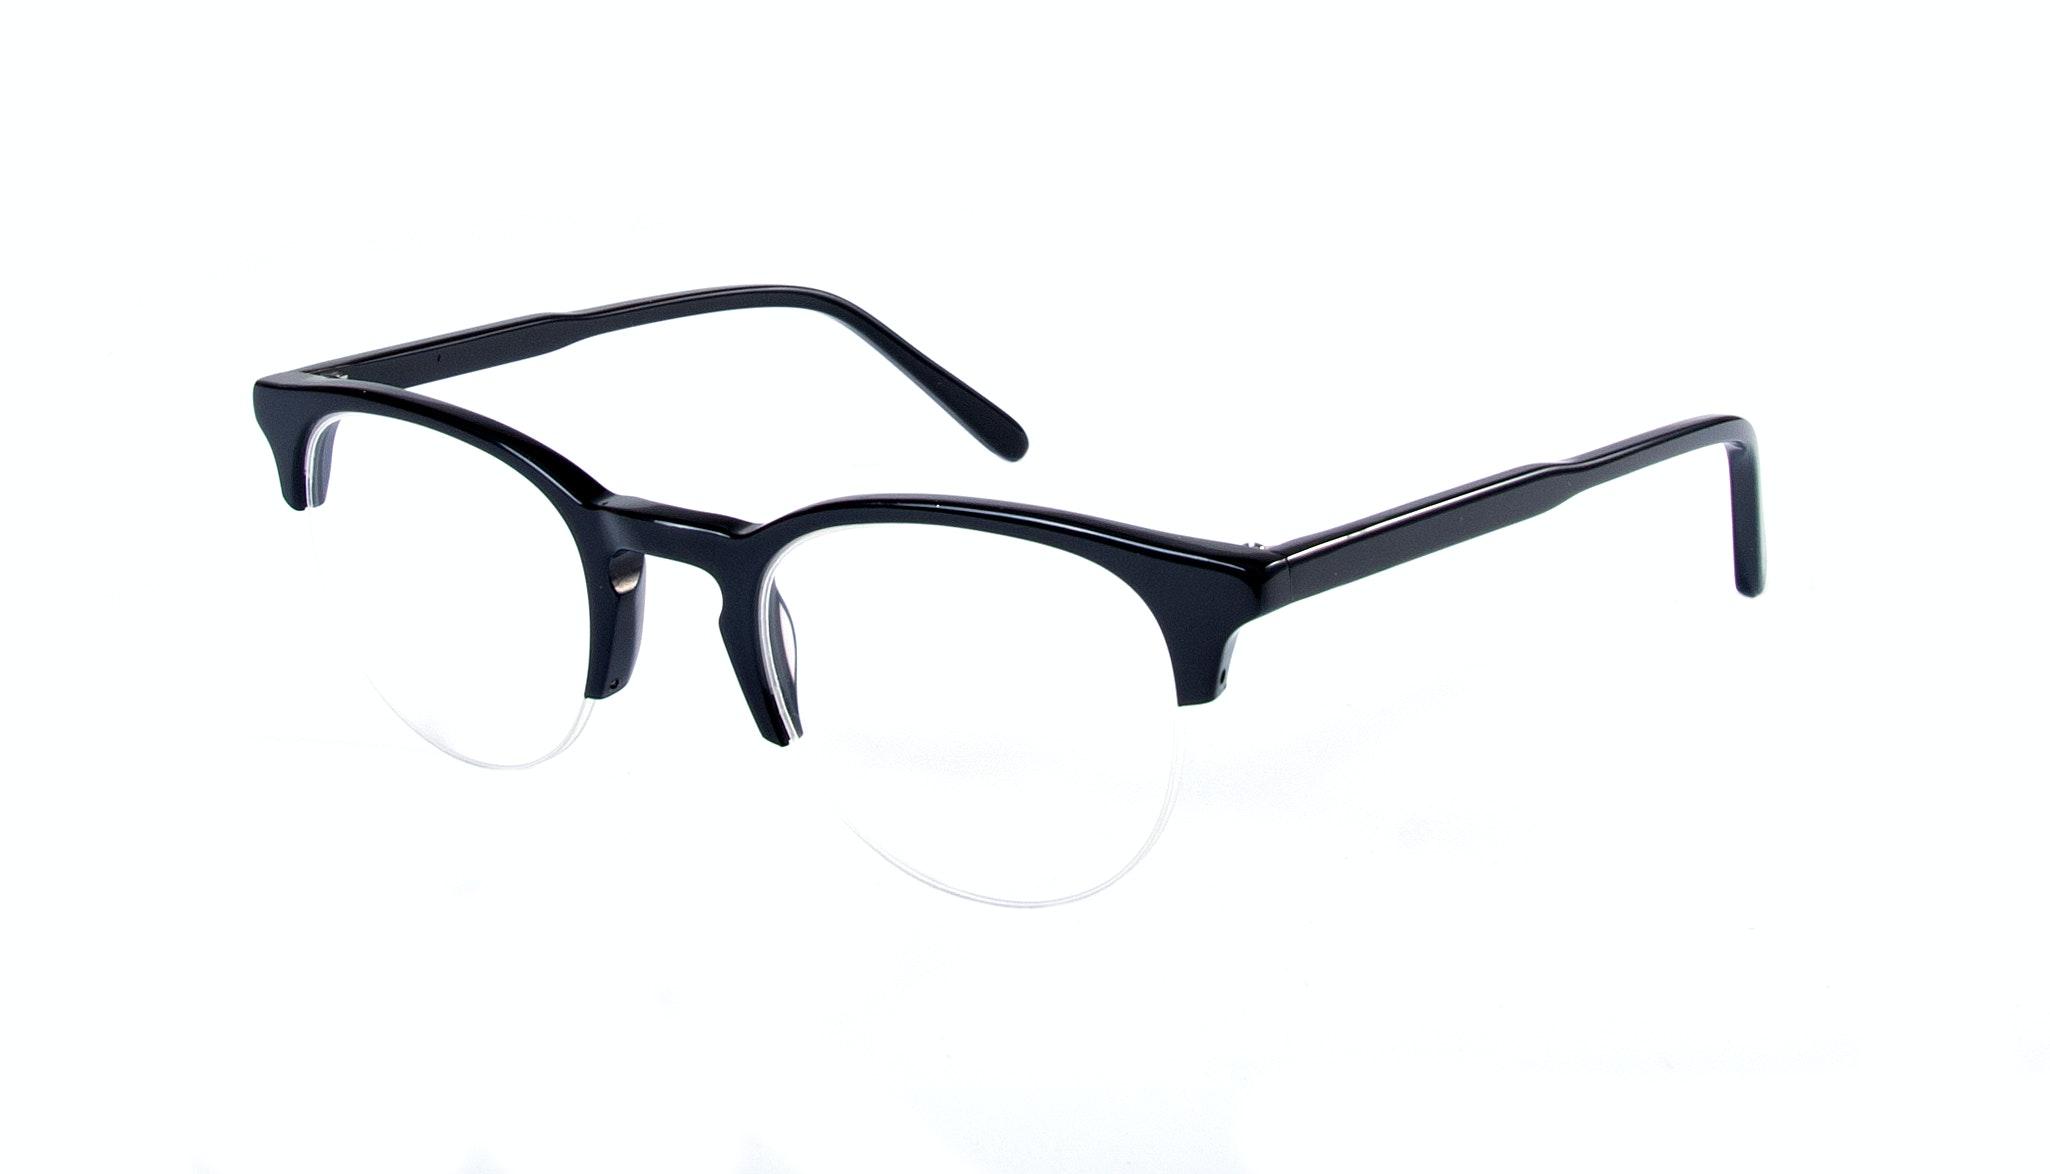 Affordable Fashion Glasses Round Semi-Rimless Eyeglasses Women Cult Light Onyx Tilt